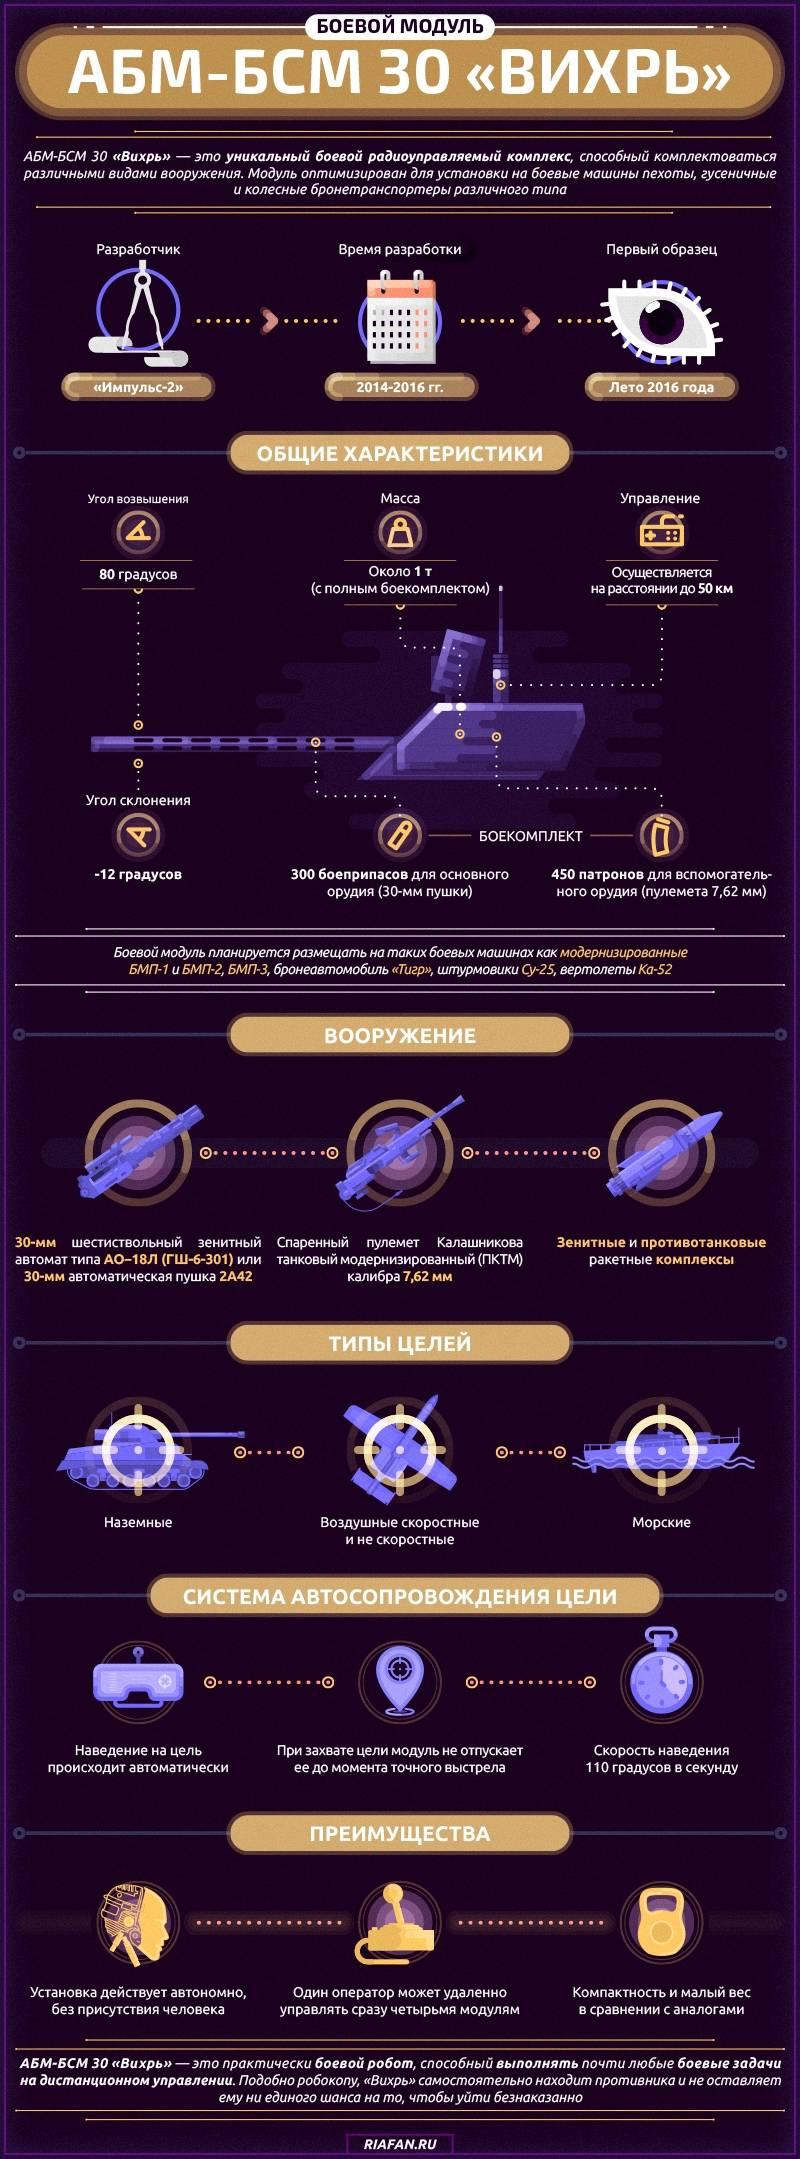 "Módulo de batalha ABM-BSM 30 ""Whirlwind"". Infográficos"